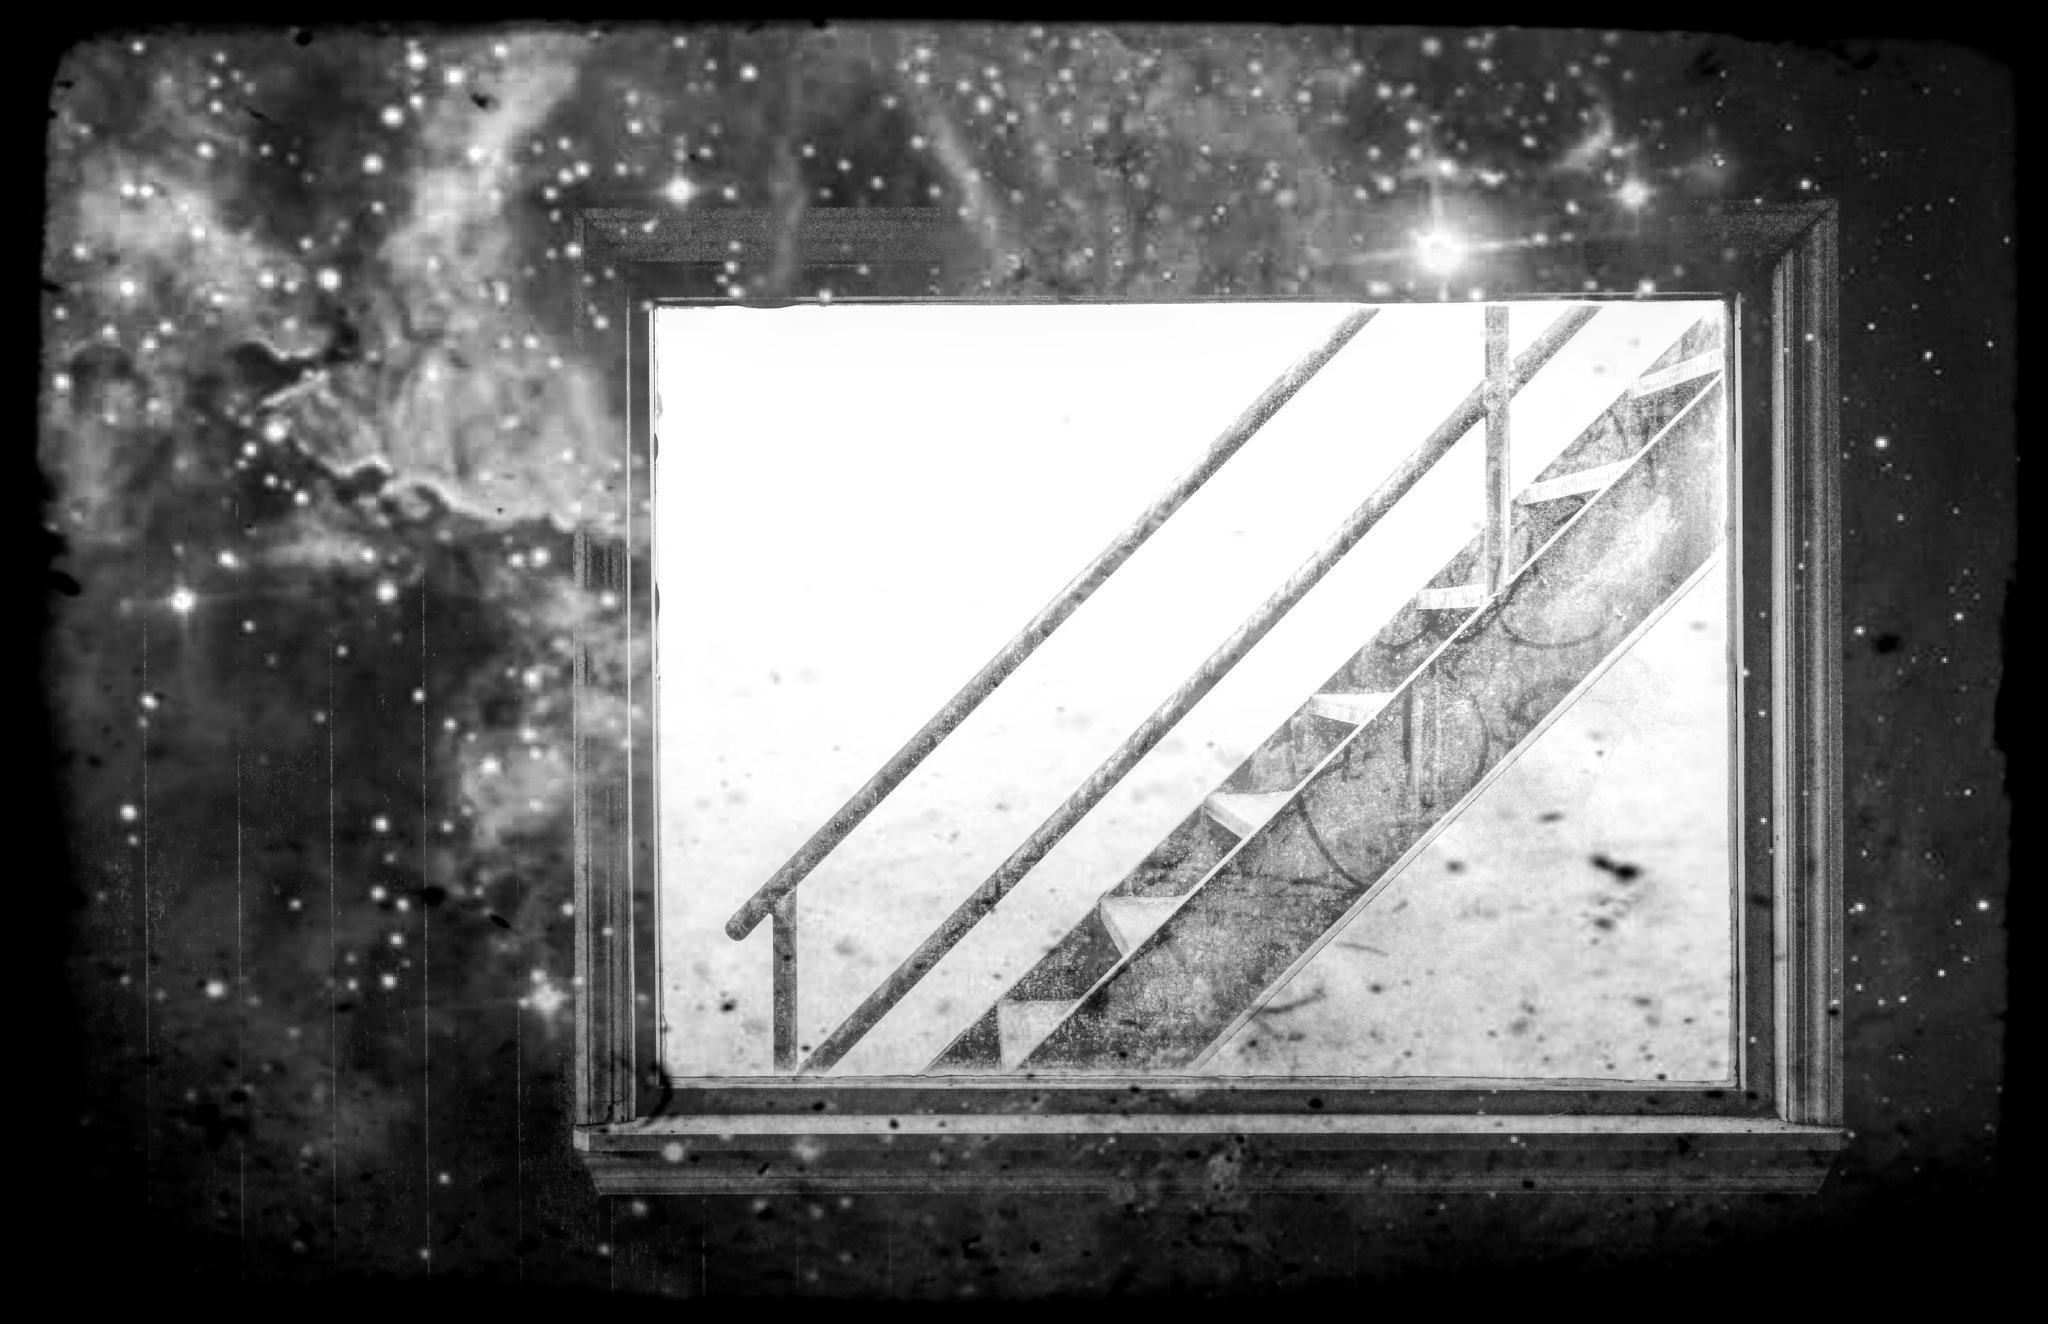 Stairway to Heaven by Mike Raker